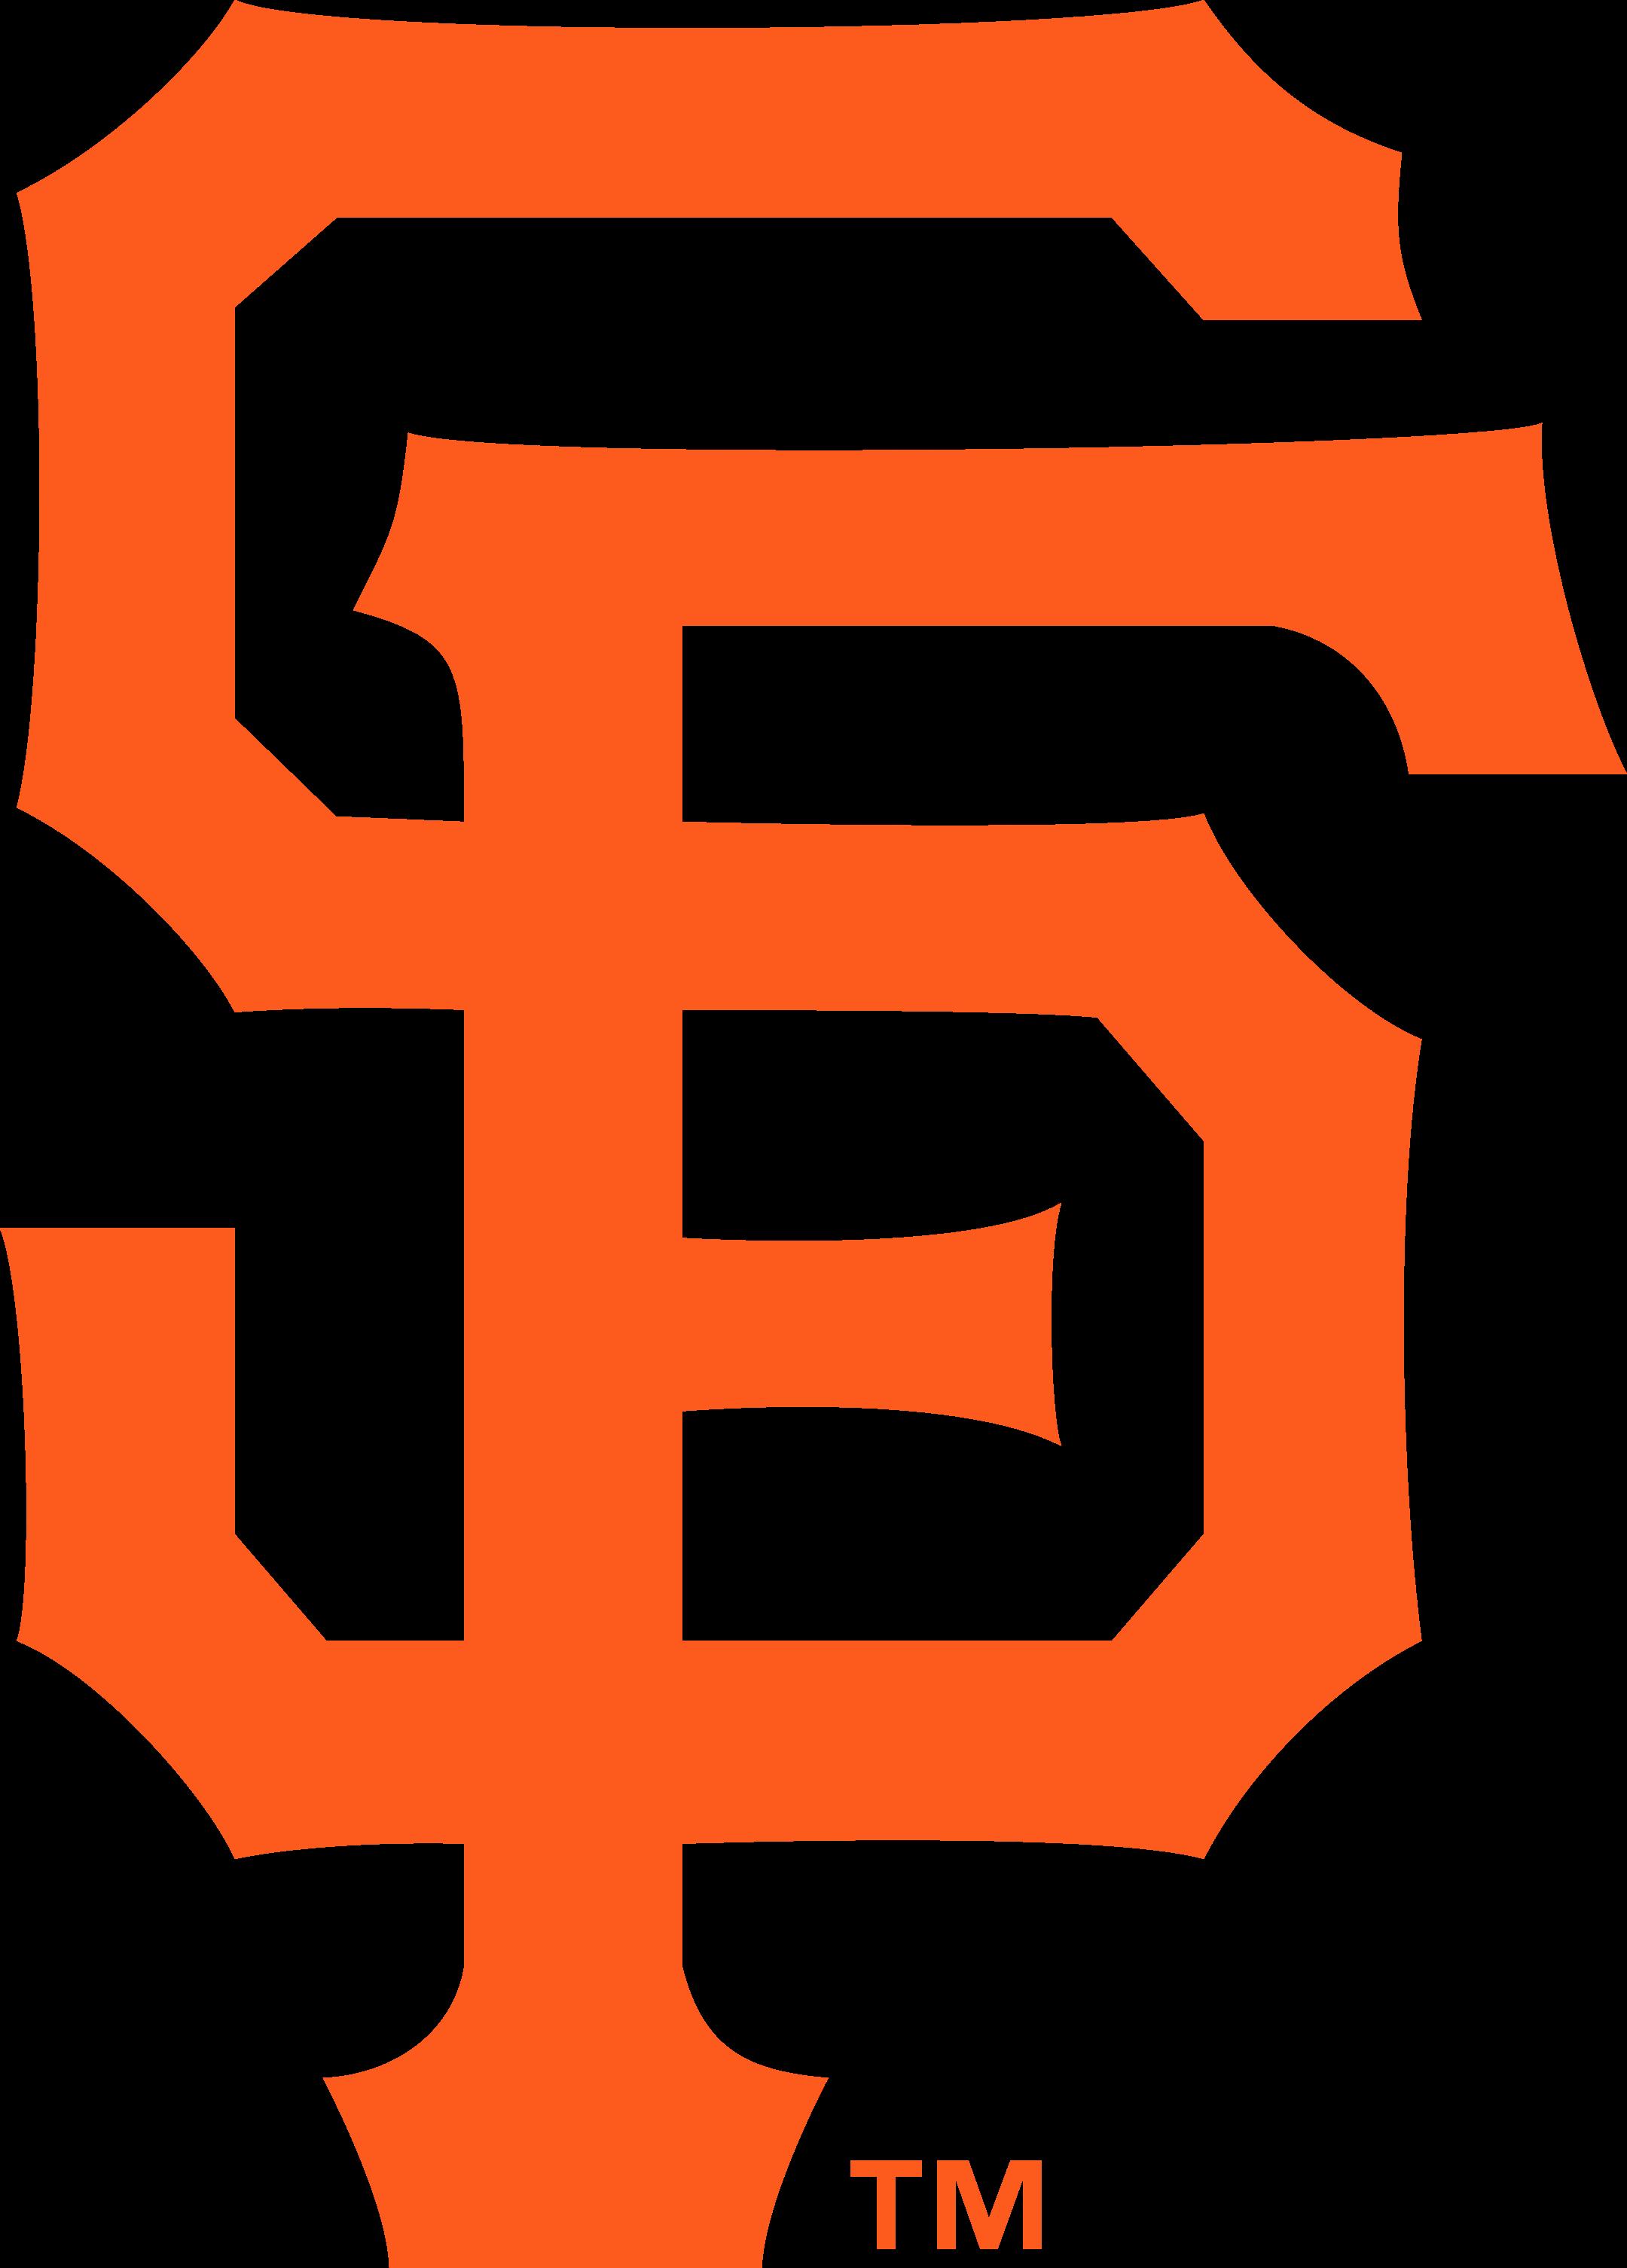 san francisco giants logo 1 - San Francisco Giants Logo